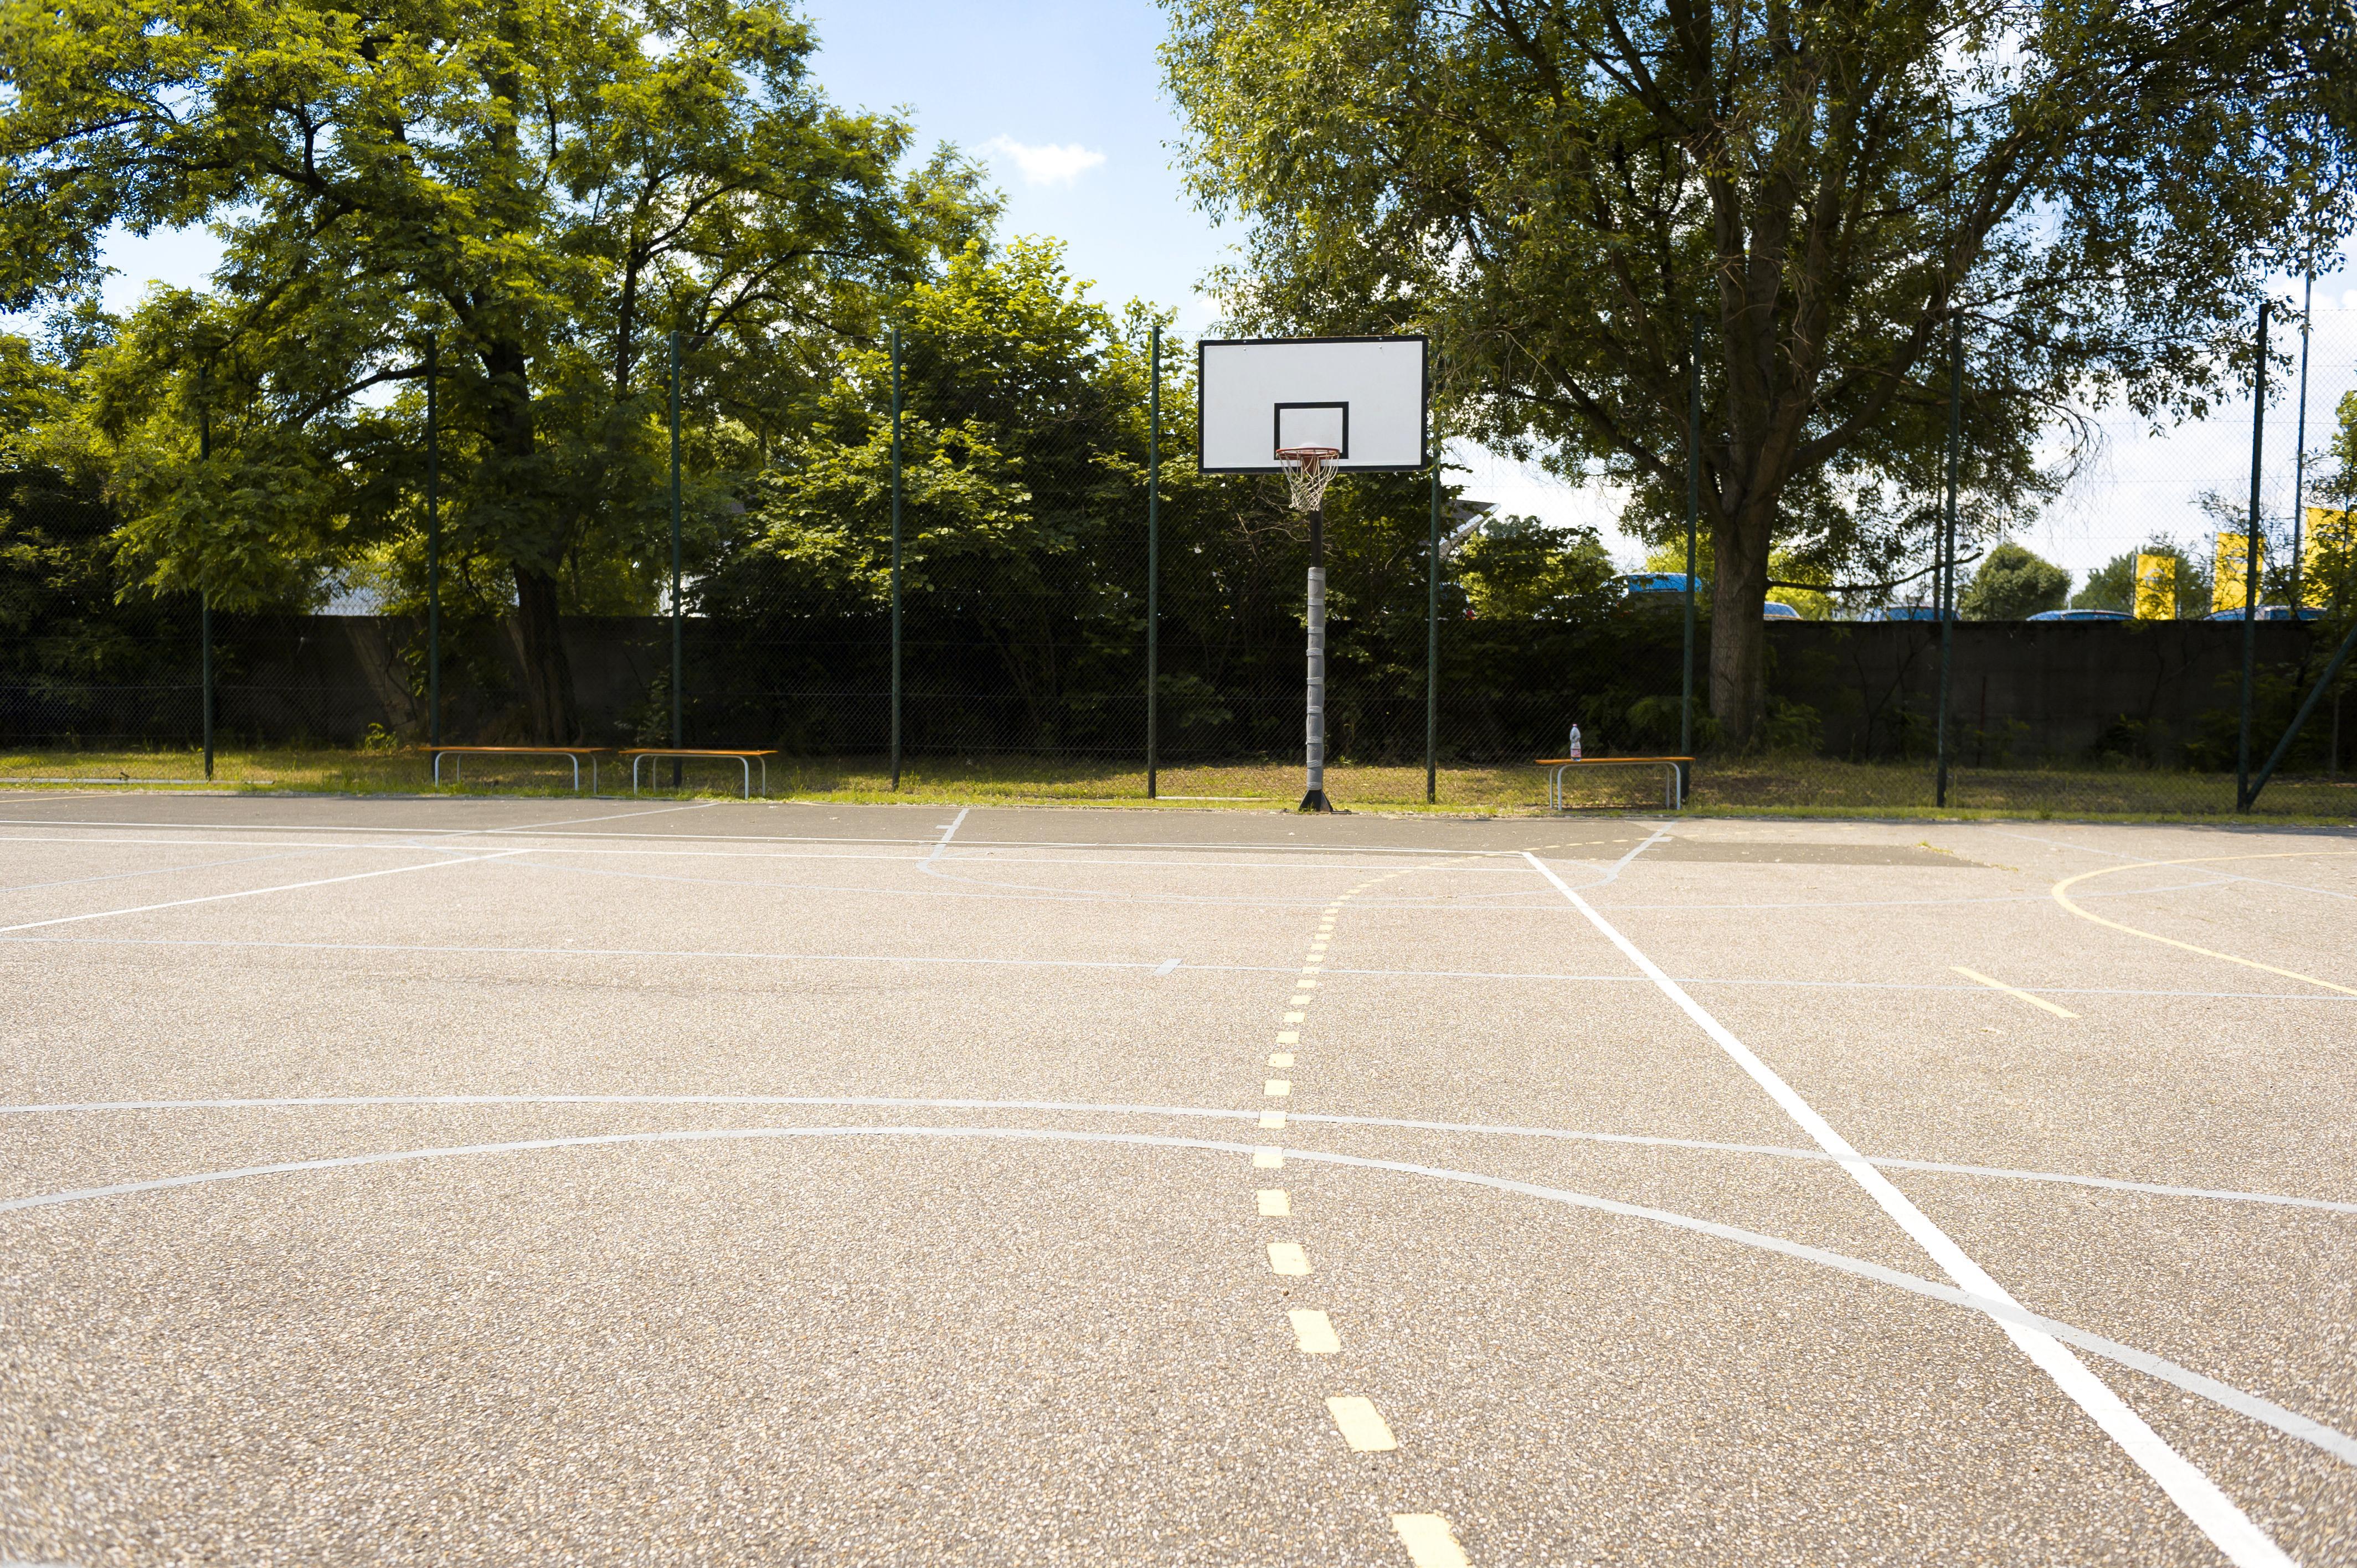 Dormitory sport court